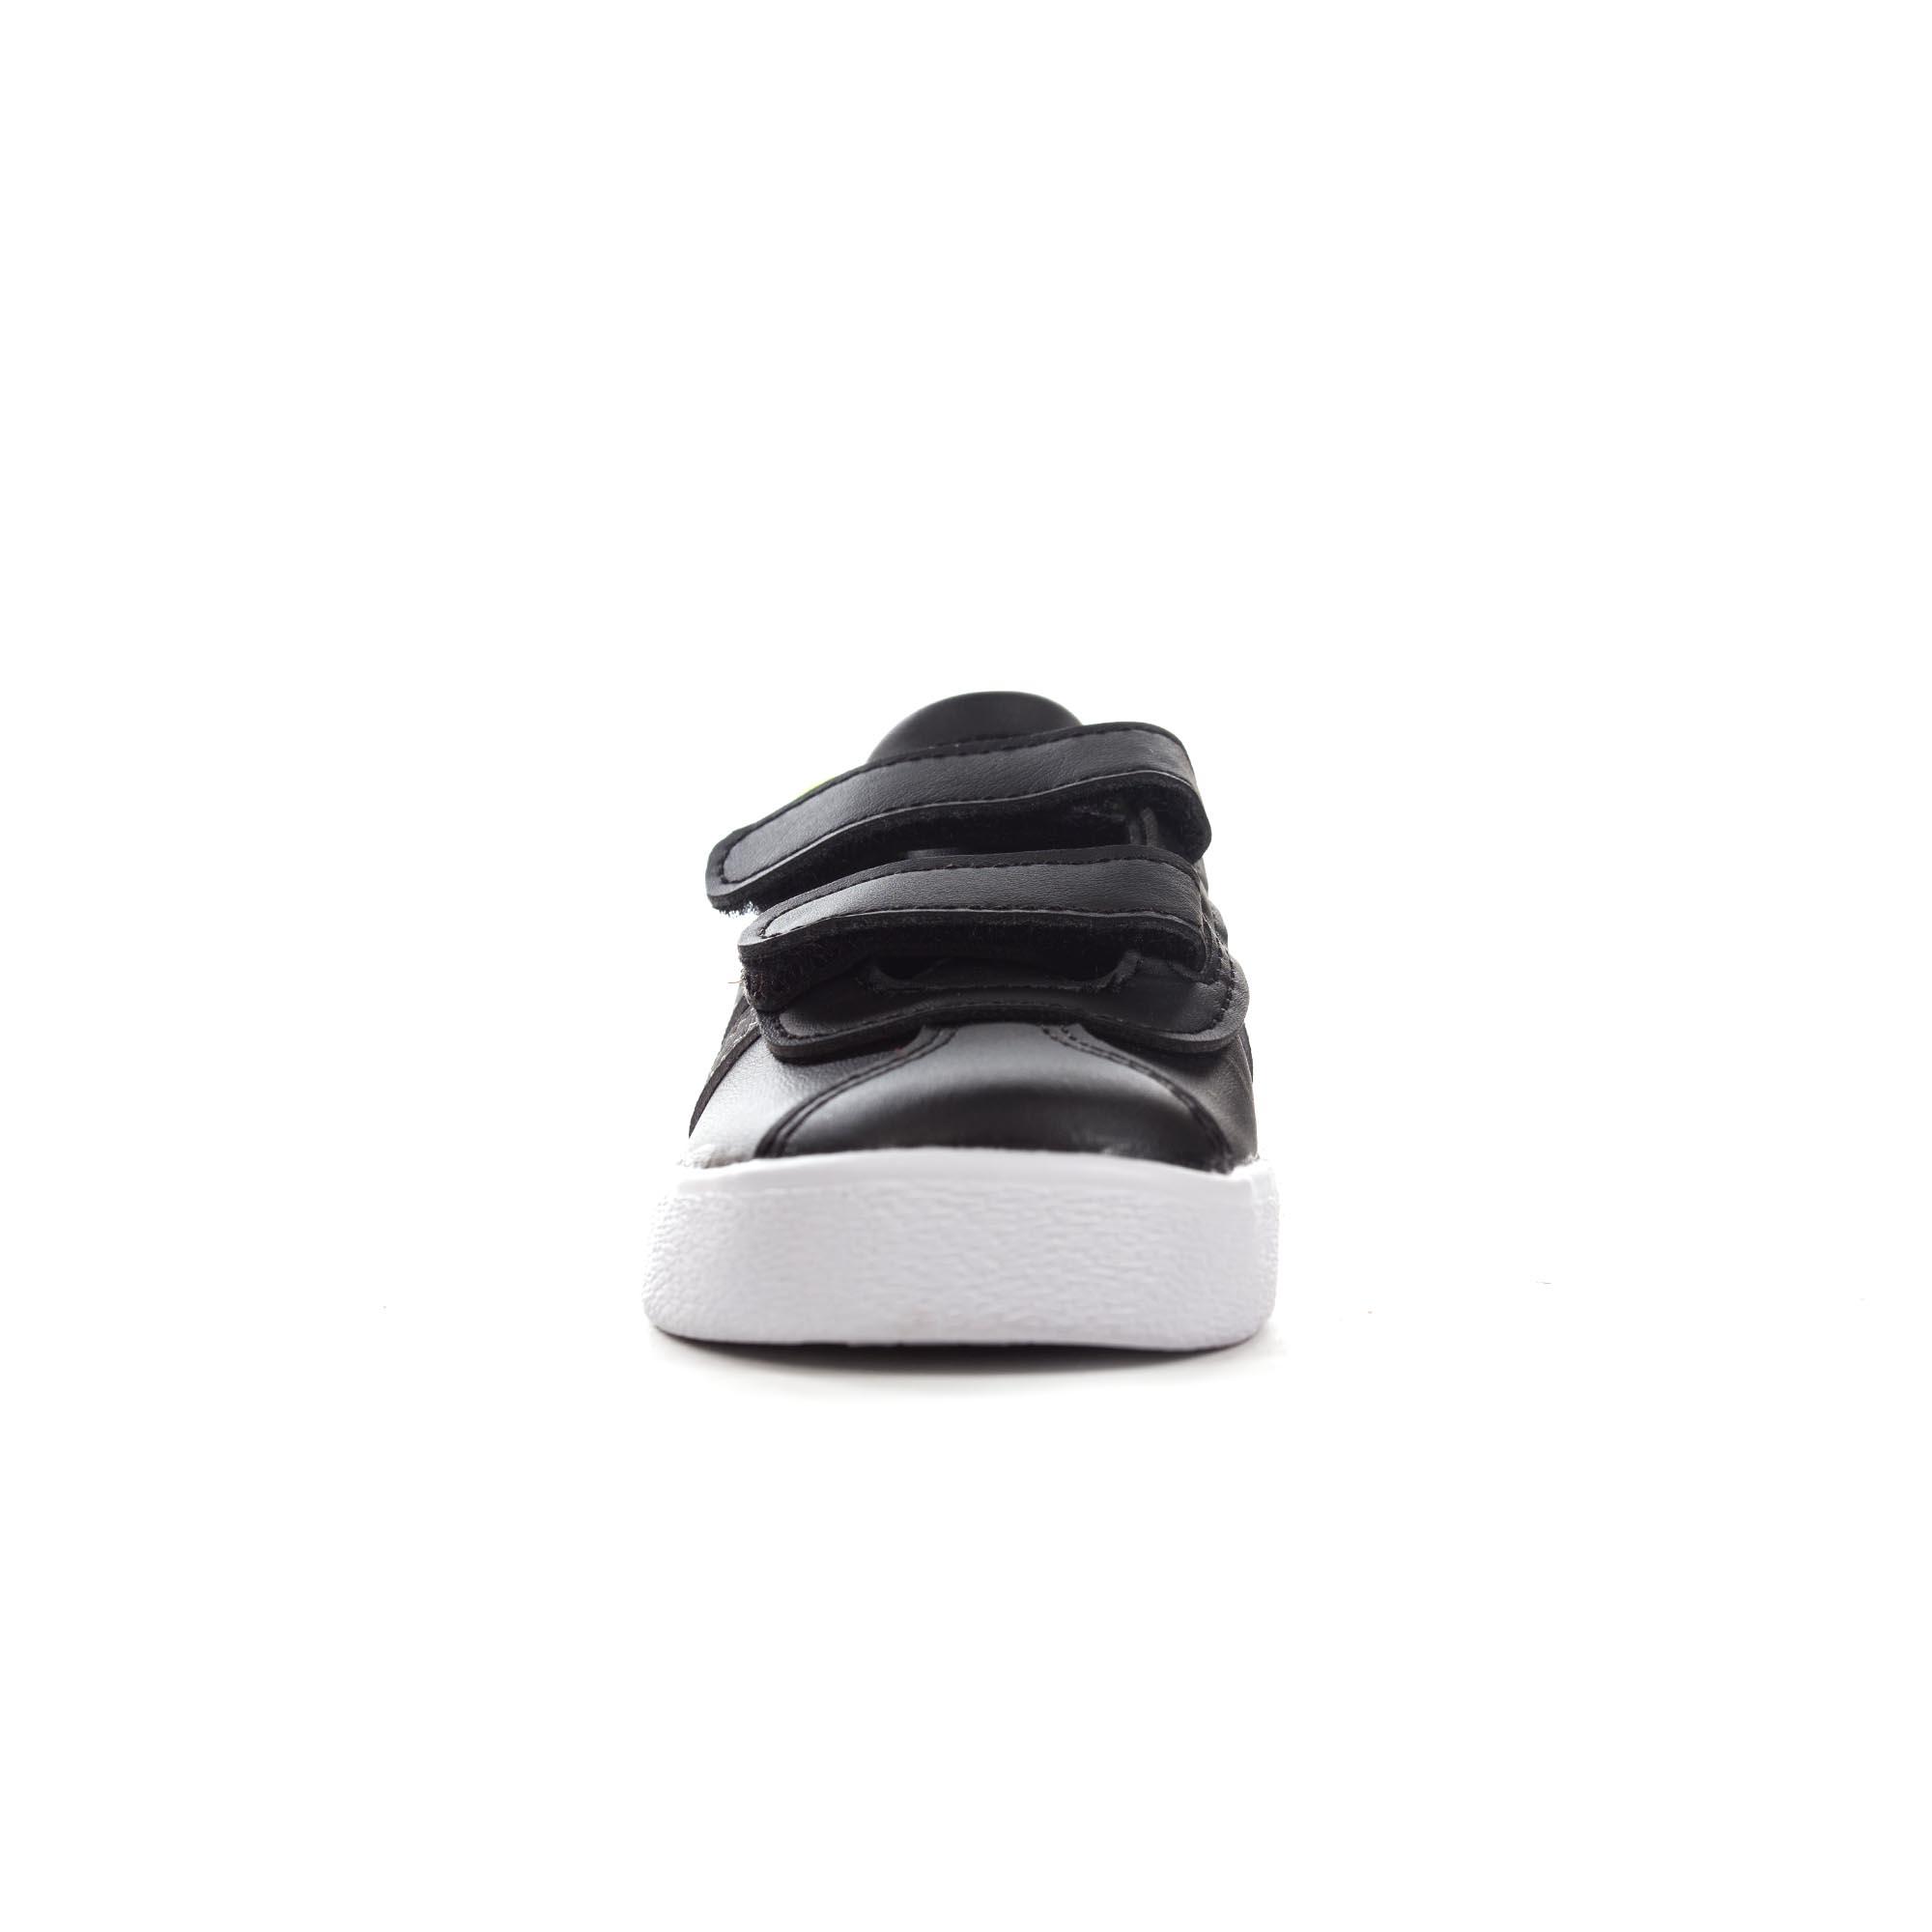 449cd3d5b3dc adidas VL Court 2.0 Infant Kids Boys Sports Trainer Shoe Black White ...